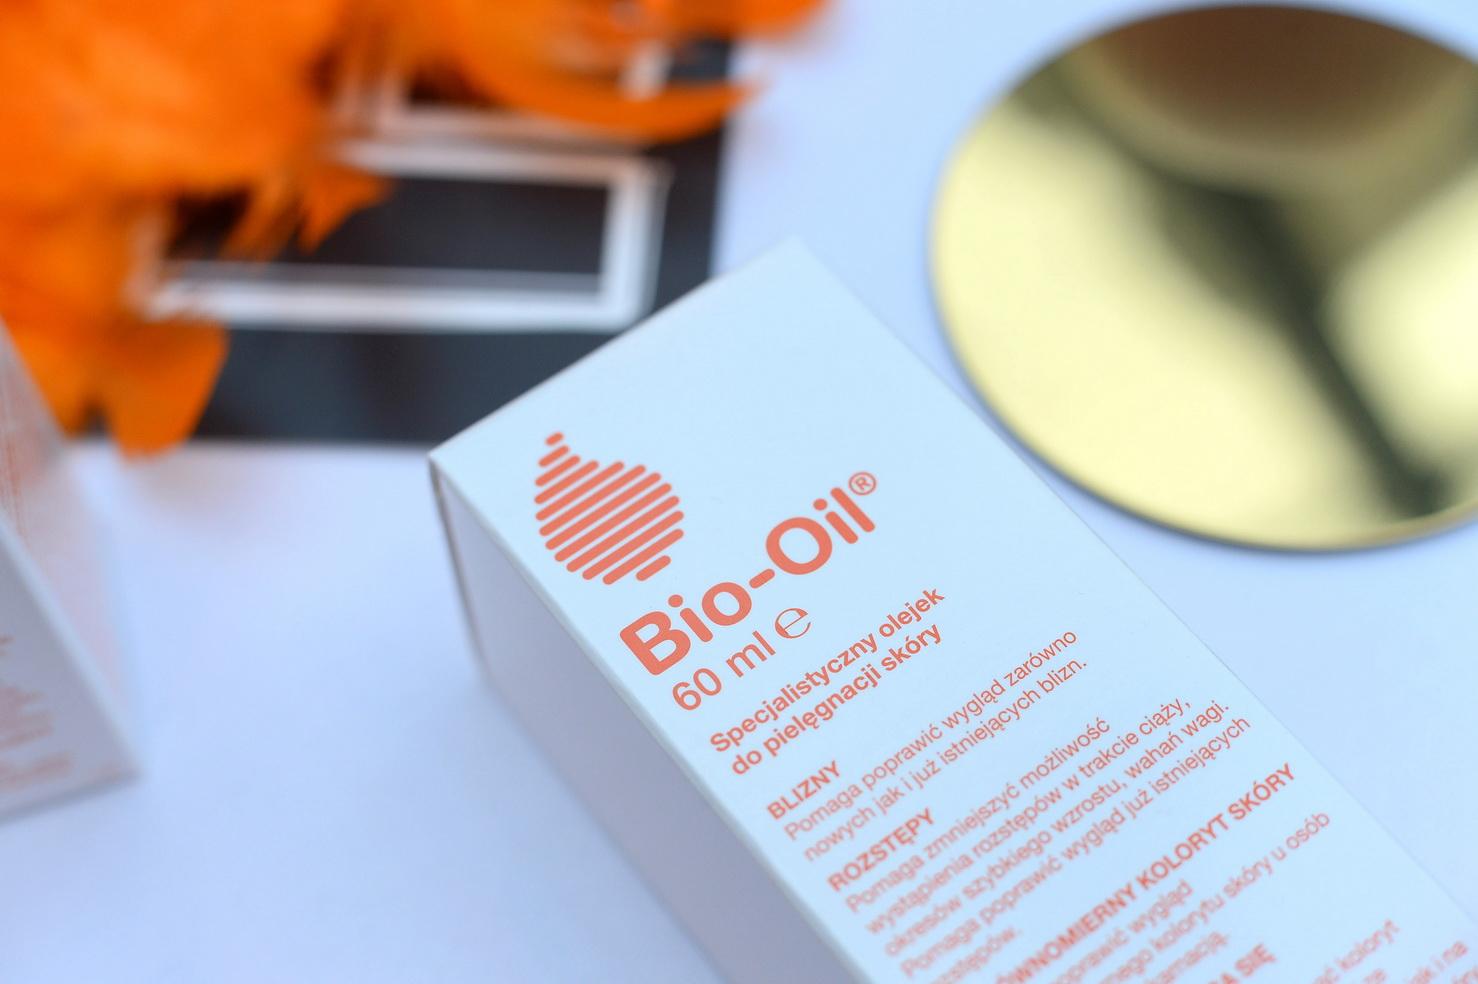 (C) 2018 Radoslaw NAWROCKI / Bio-Oil